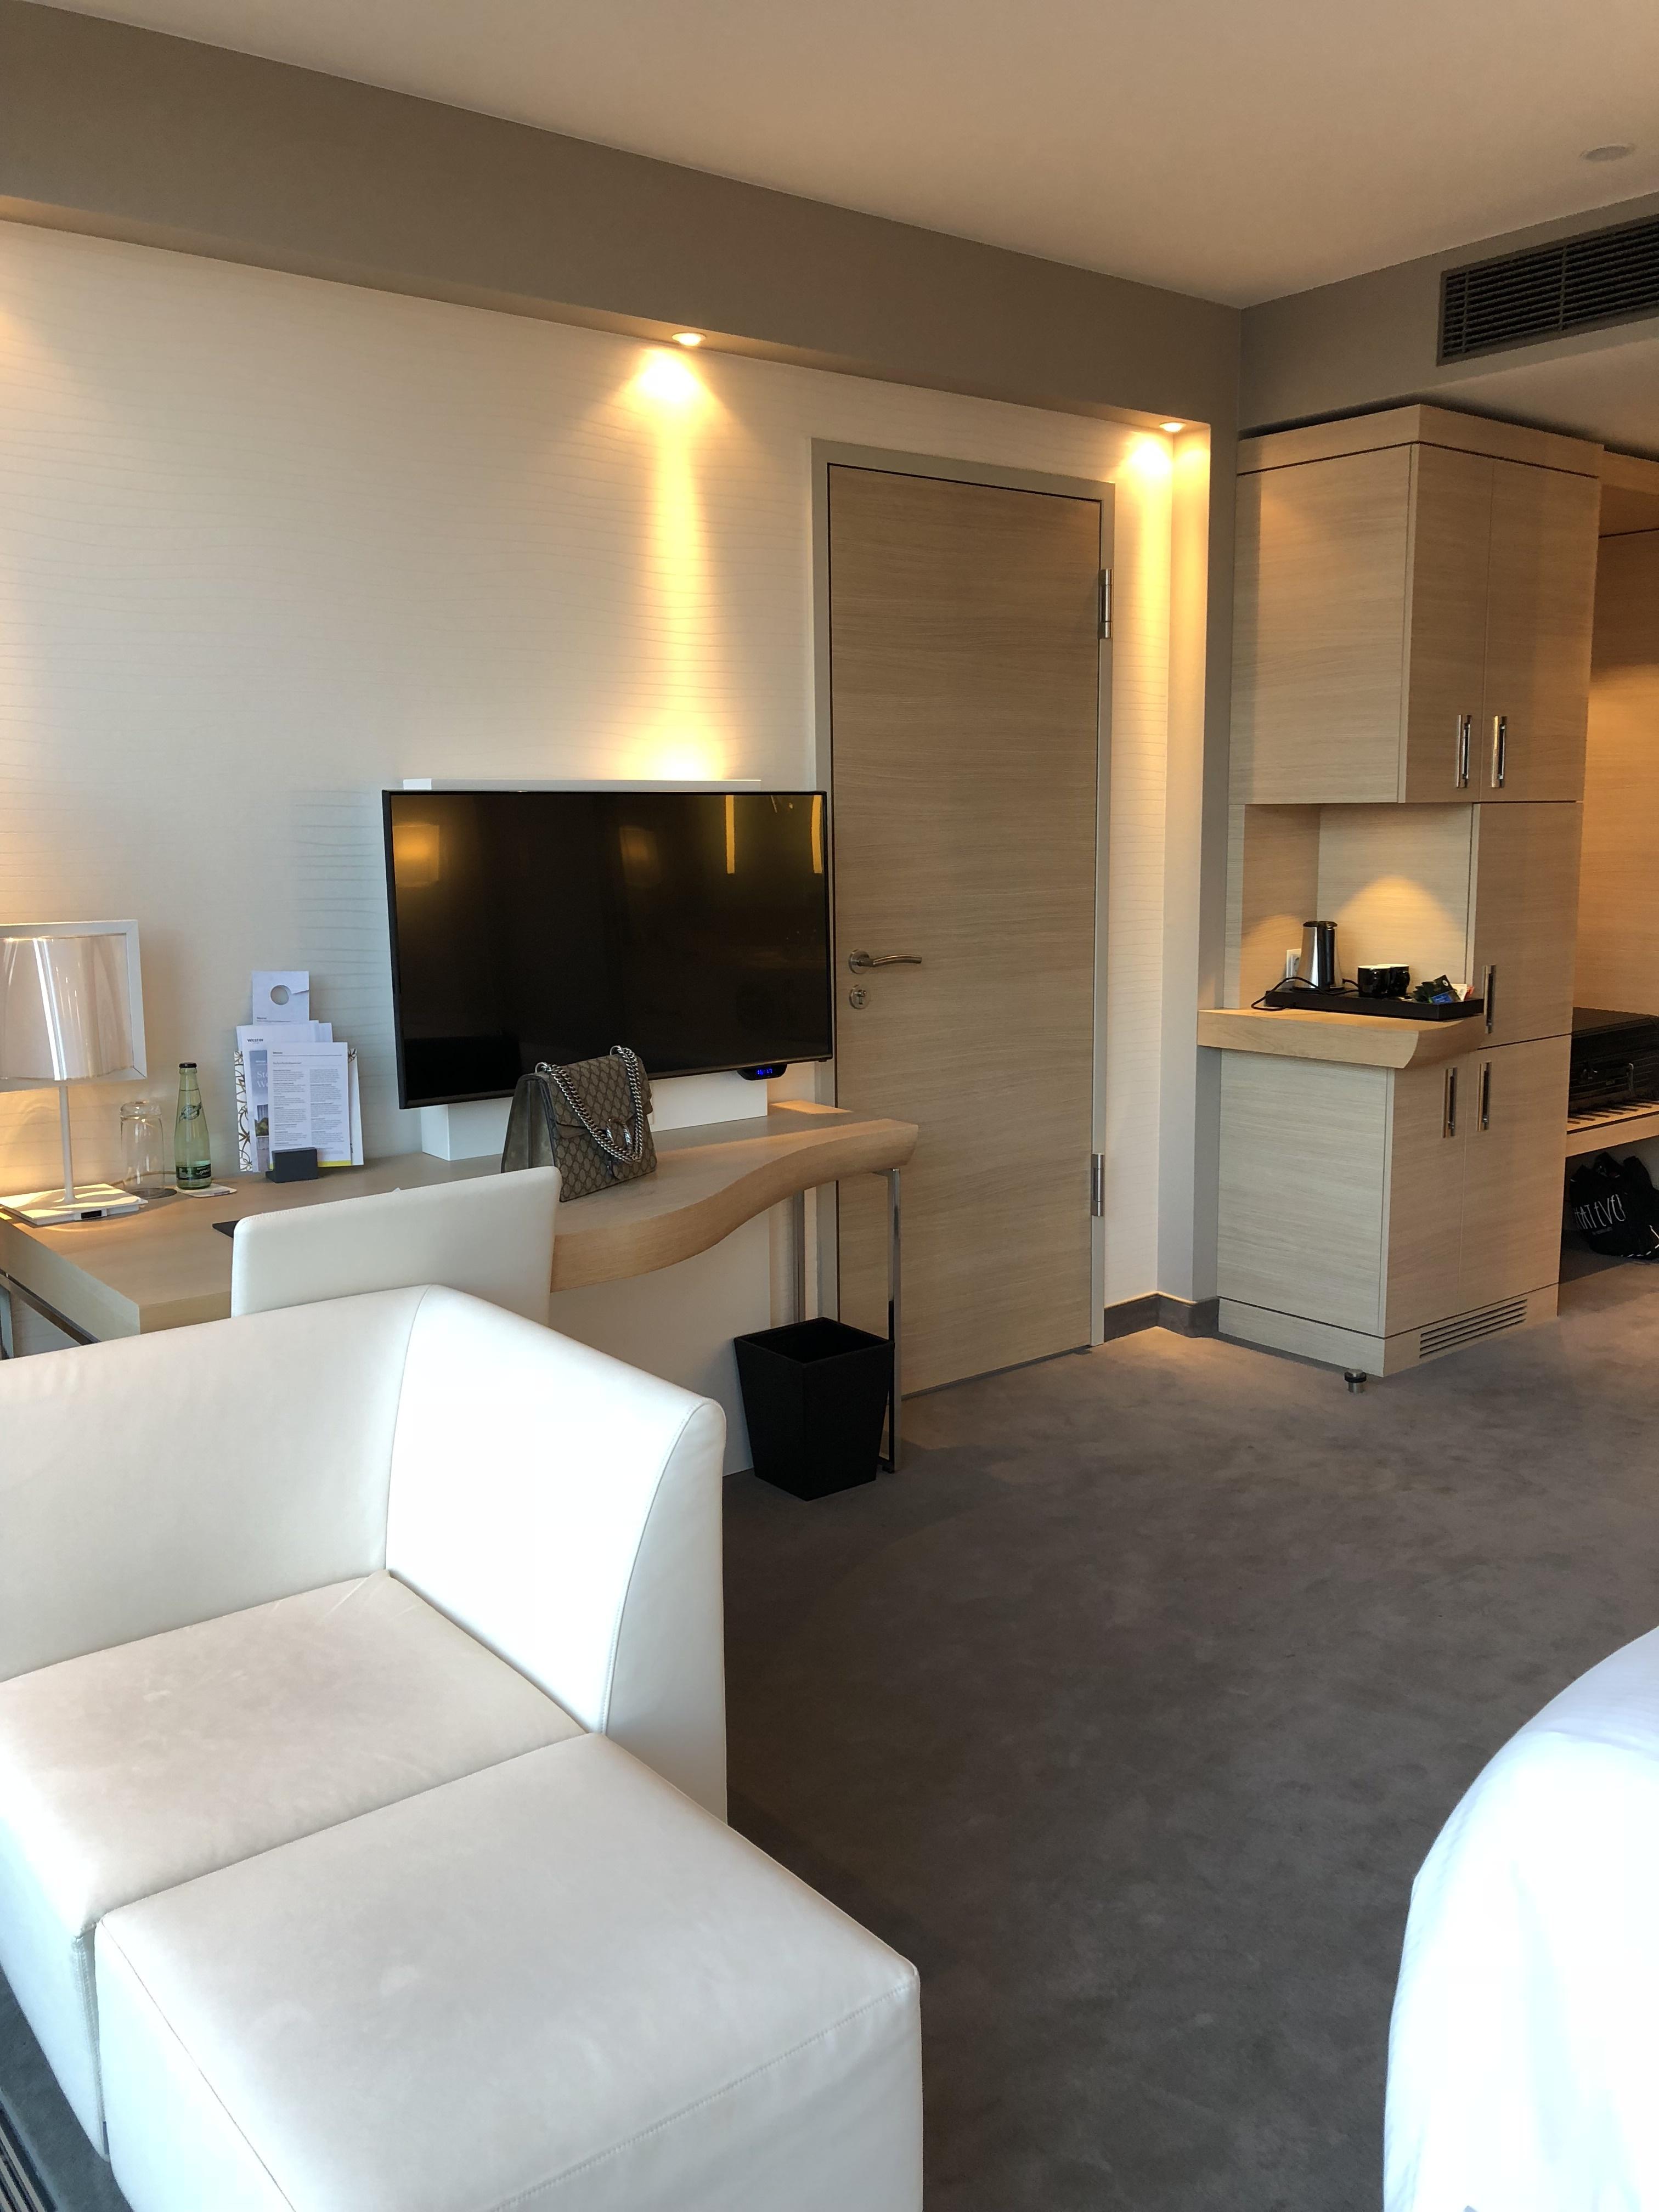 Westin Hamburg - Hotel Review - KIM ENGEL